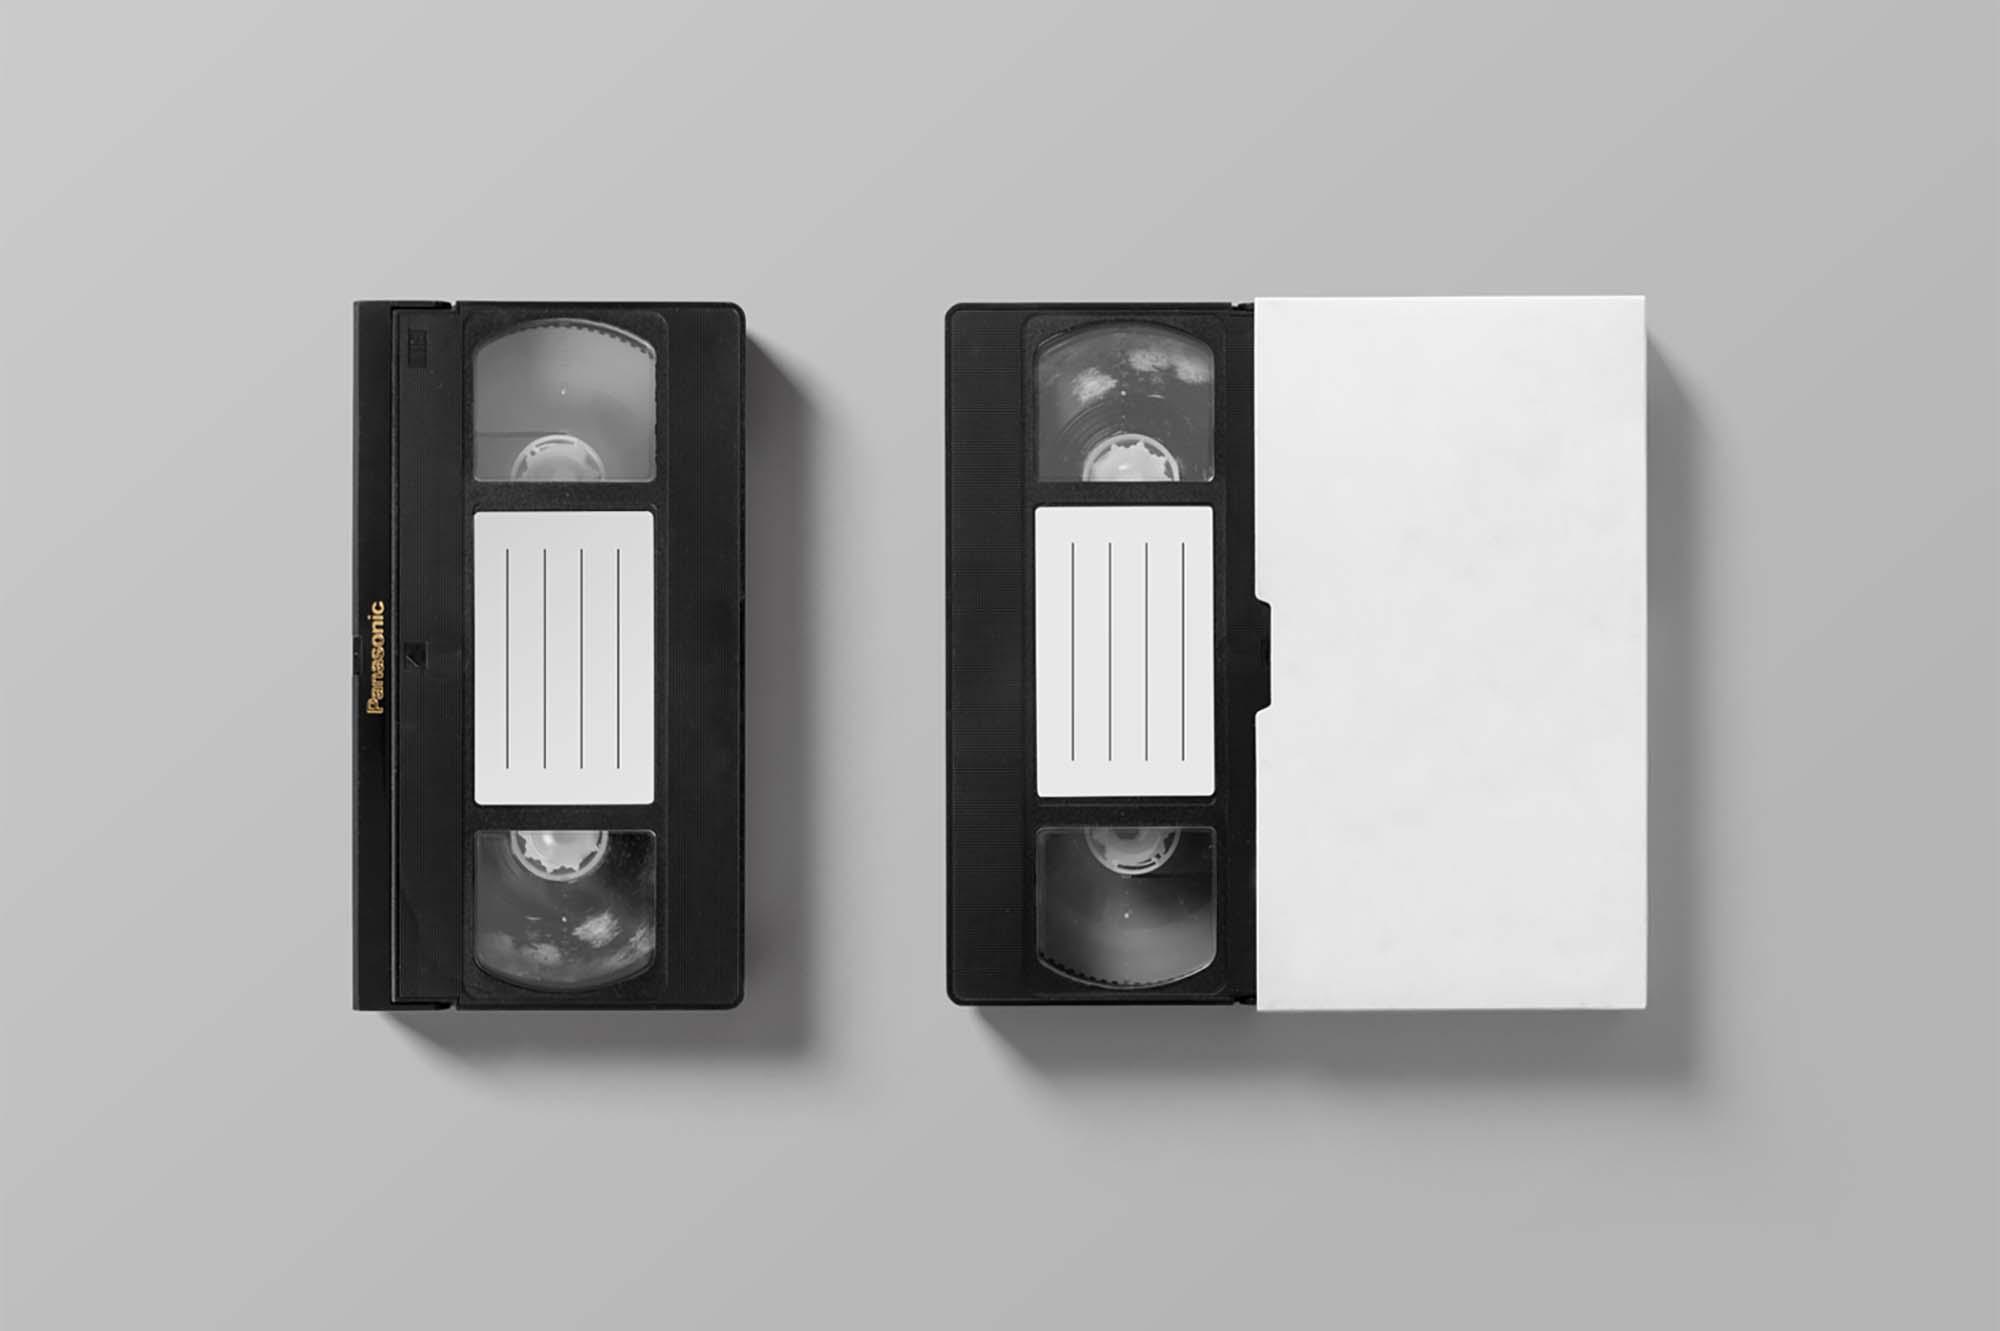 VHS Tape Mockup 2